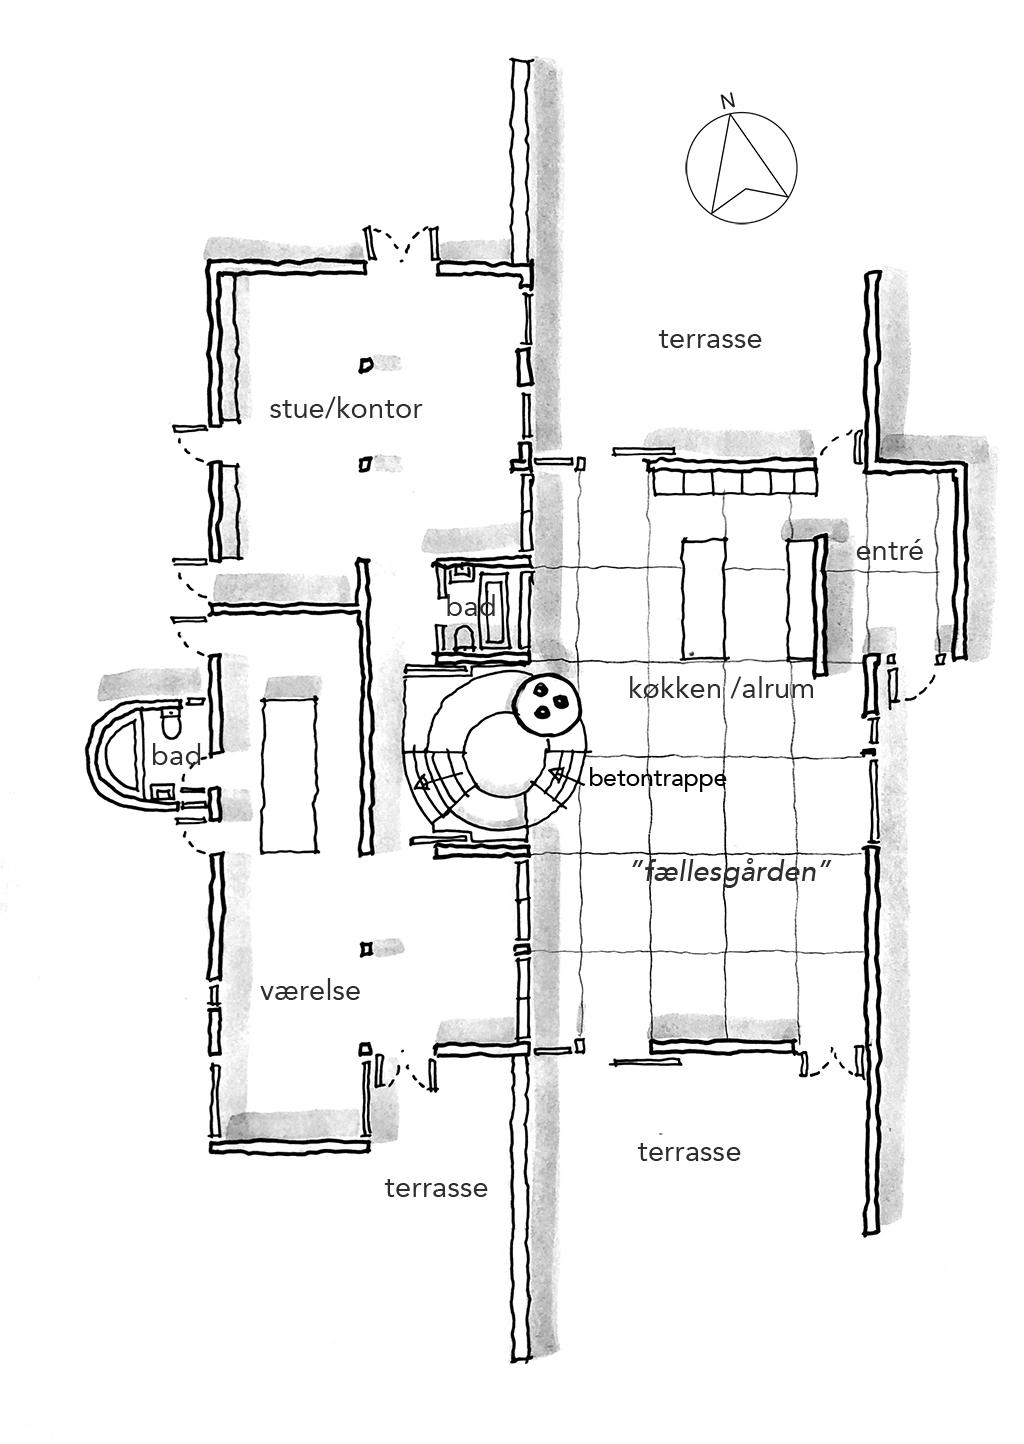 Planskitse, arkitekttegning, Arkitekt Svend Wichmann villa plan